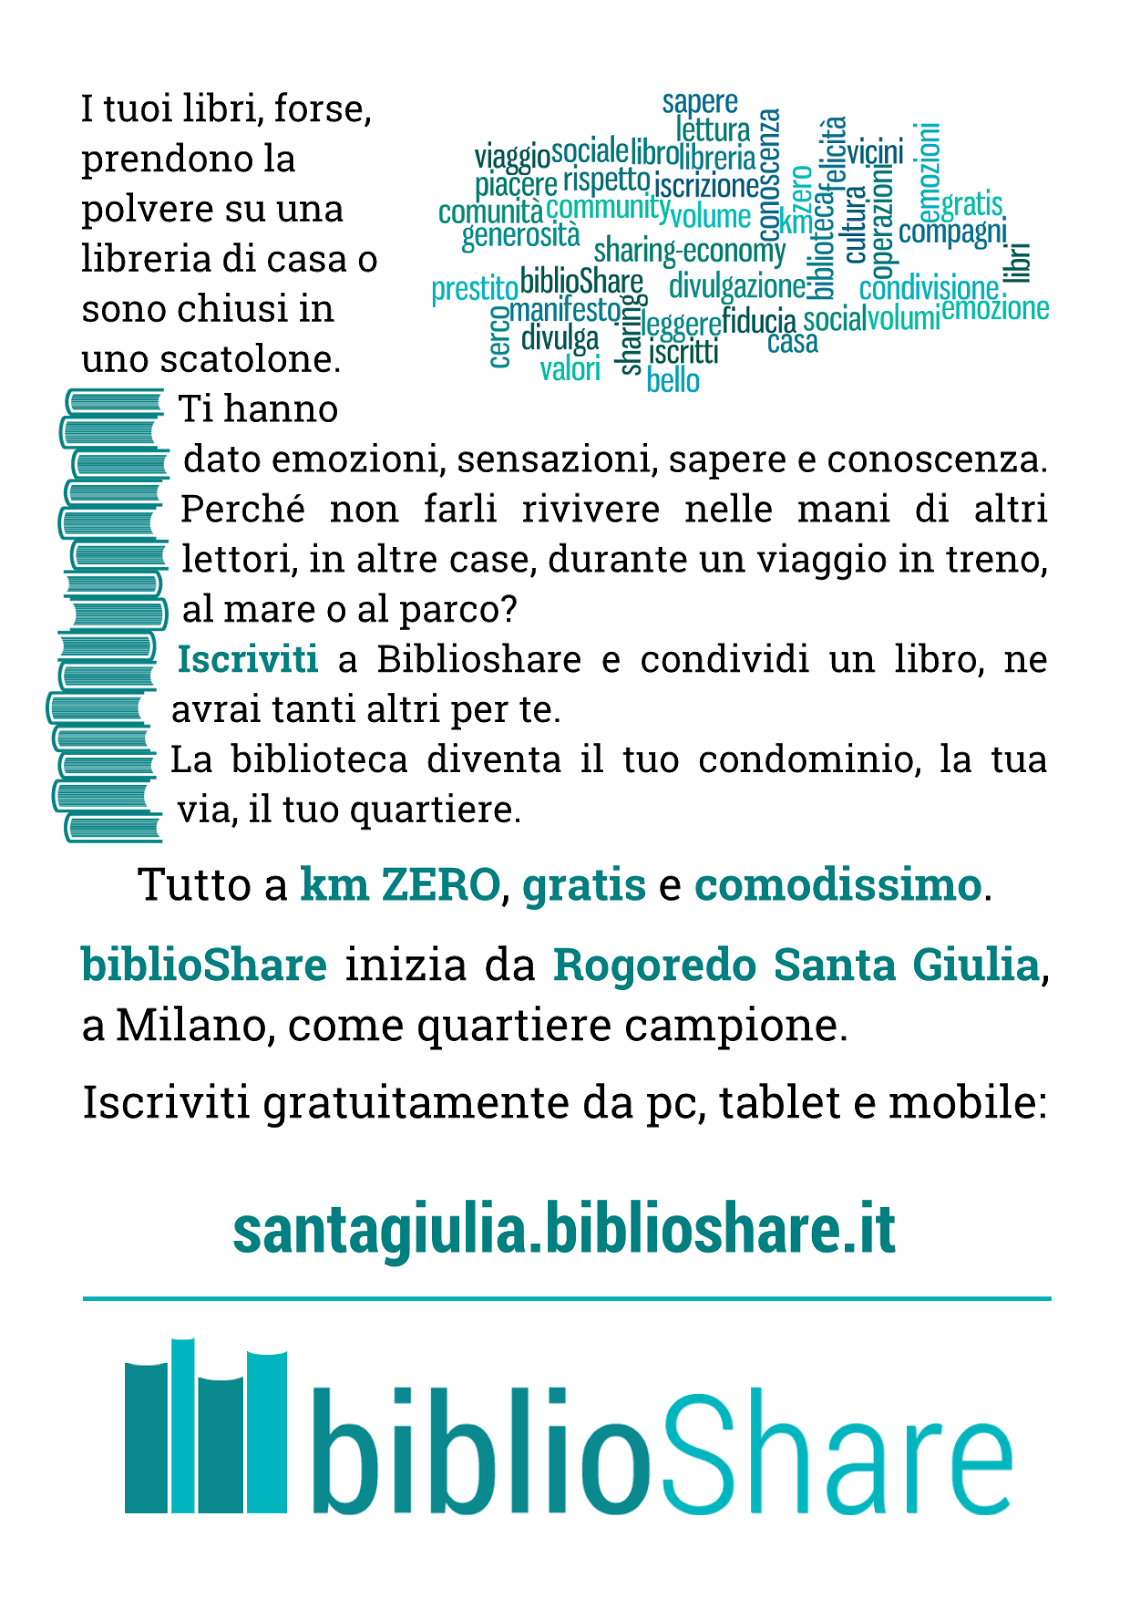 BiblioShare